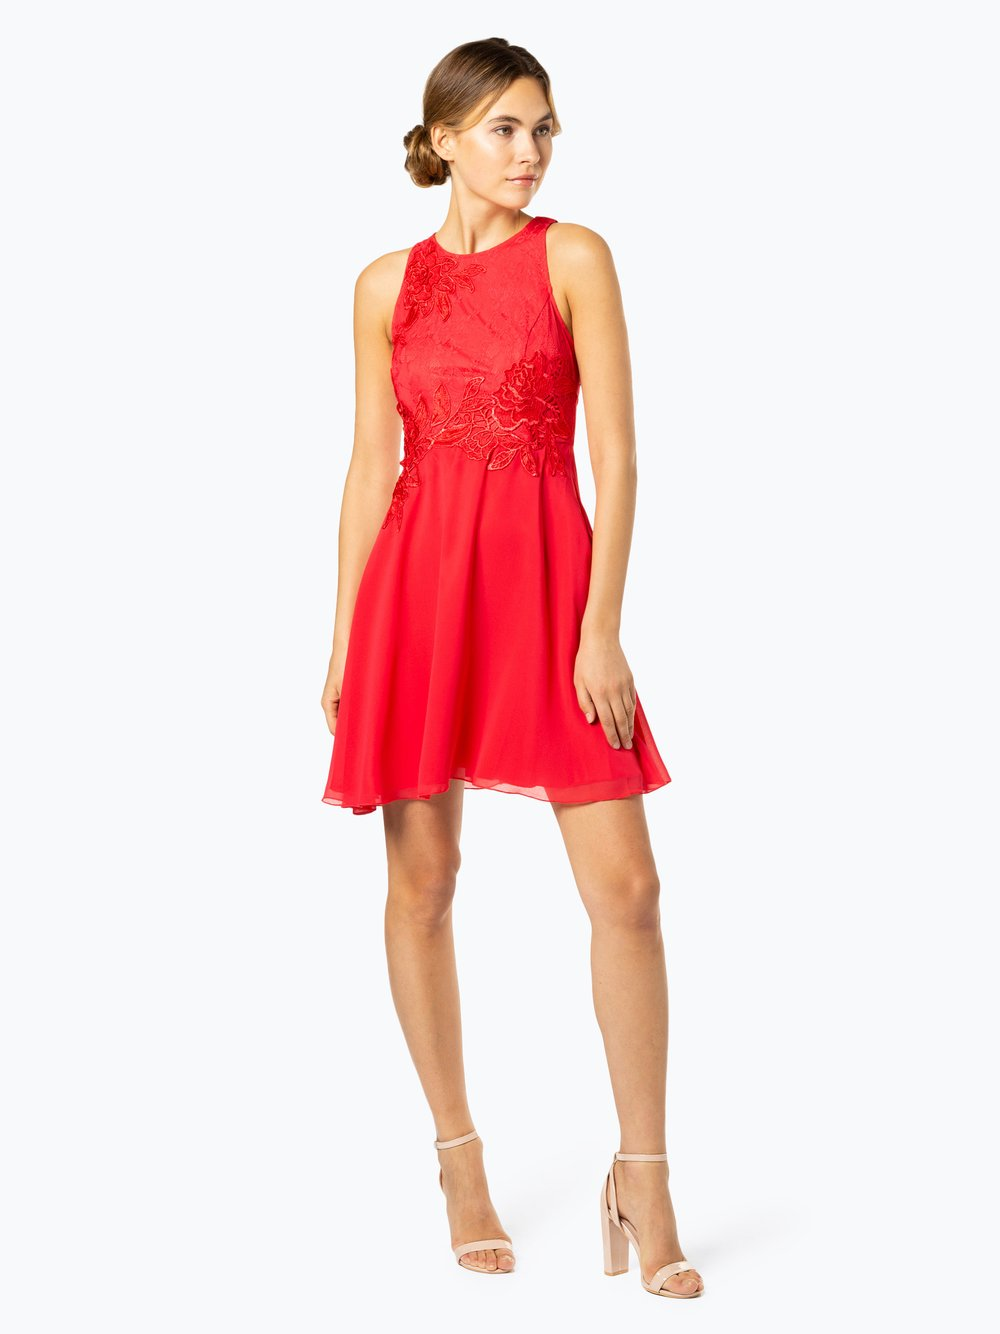 Suddenly Princess Damen Abendkleid online kaufen  VANGRAAF.COM